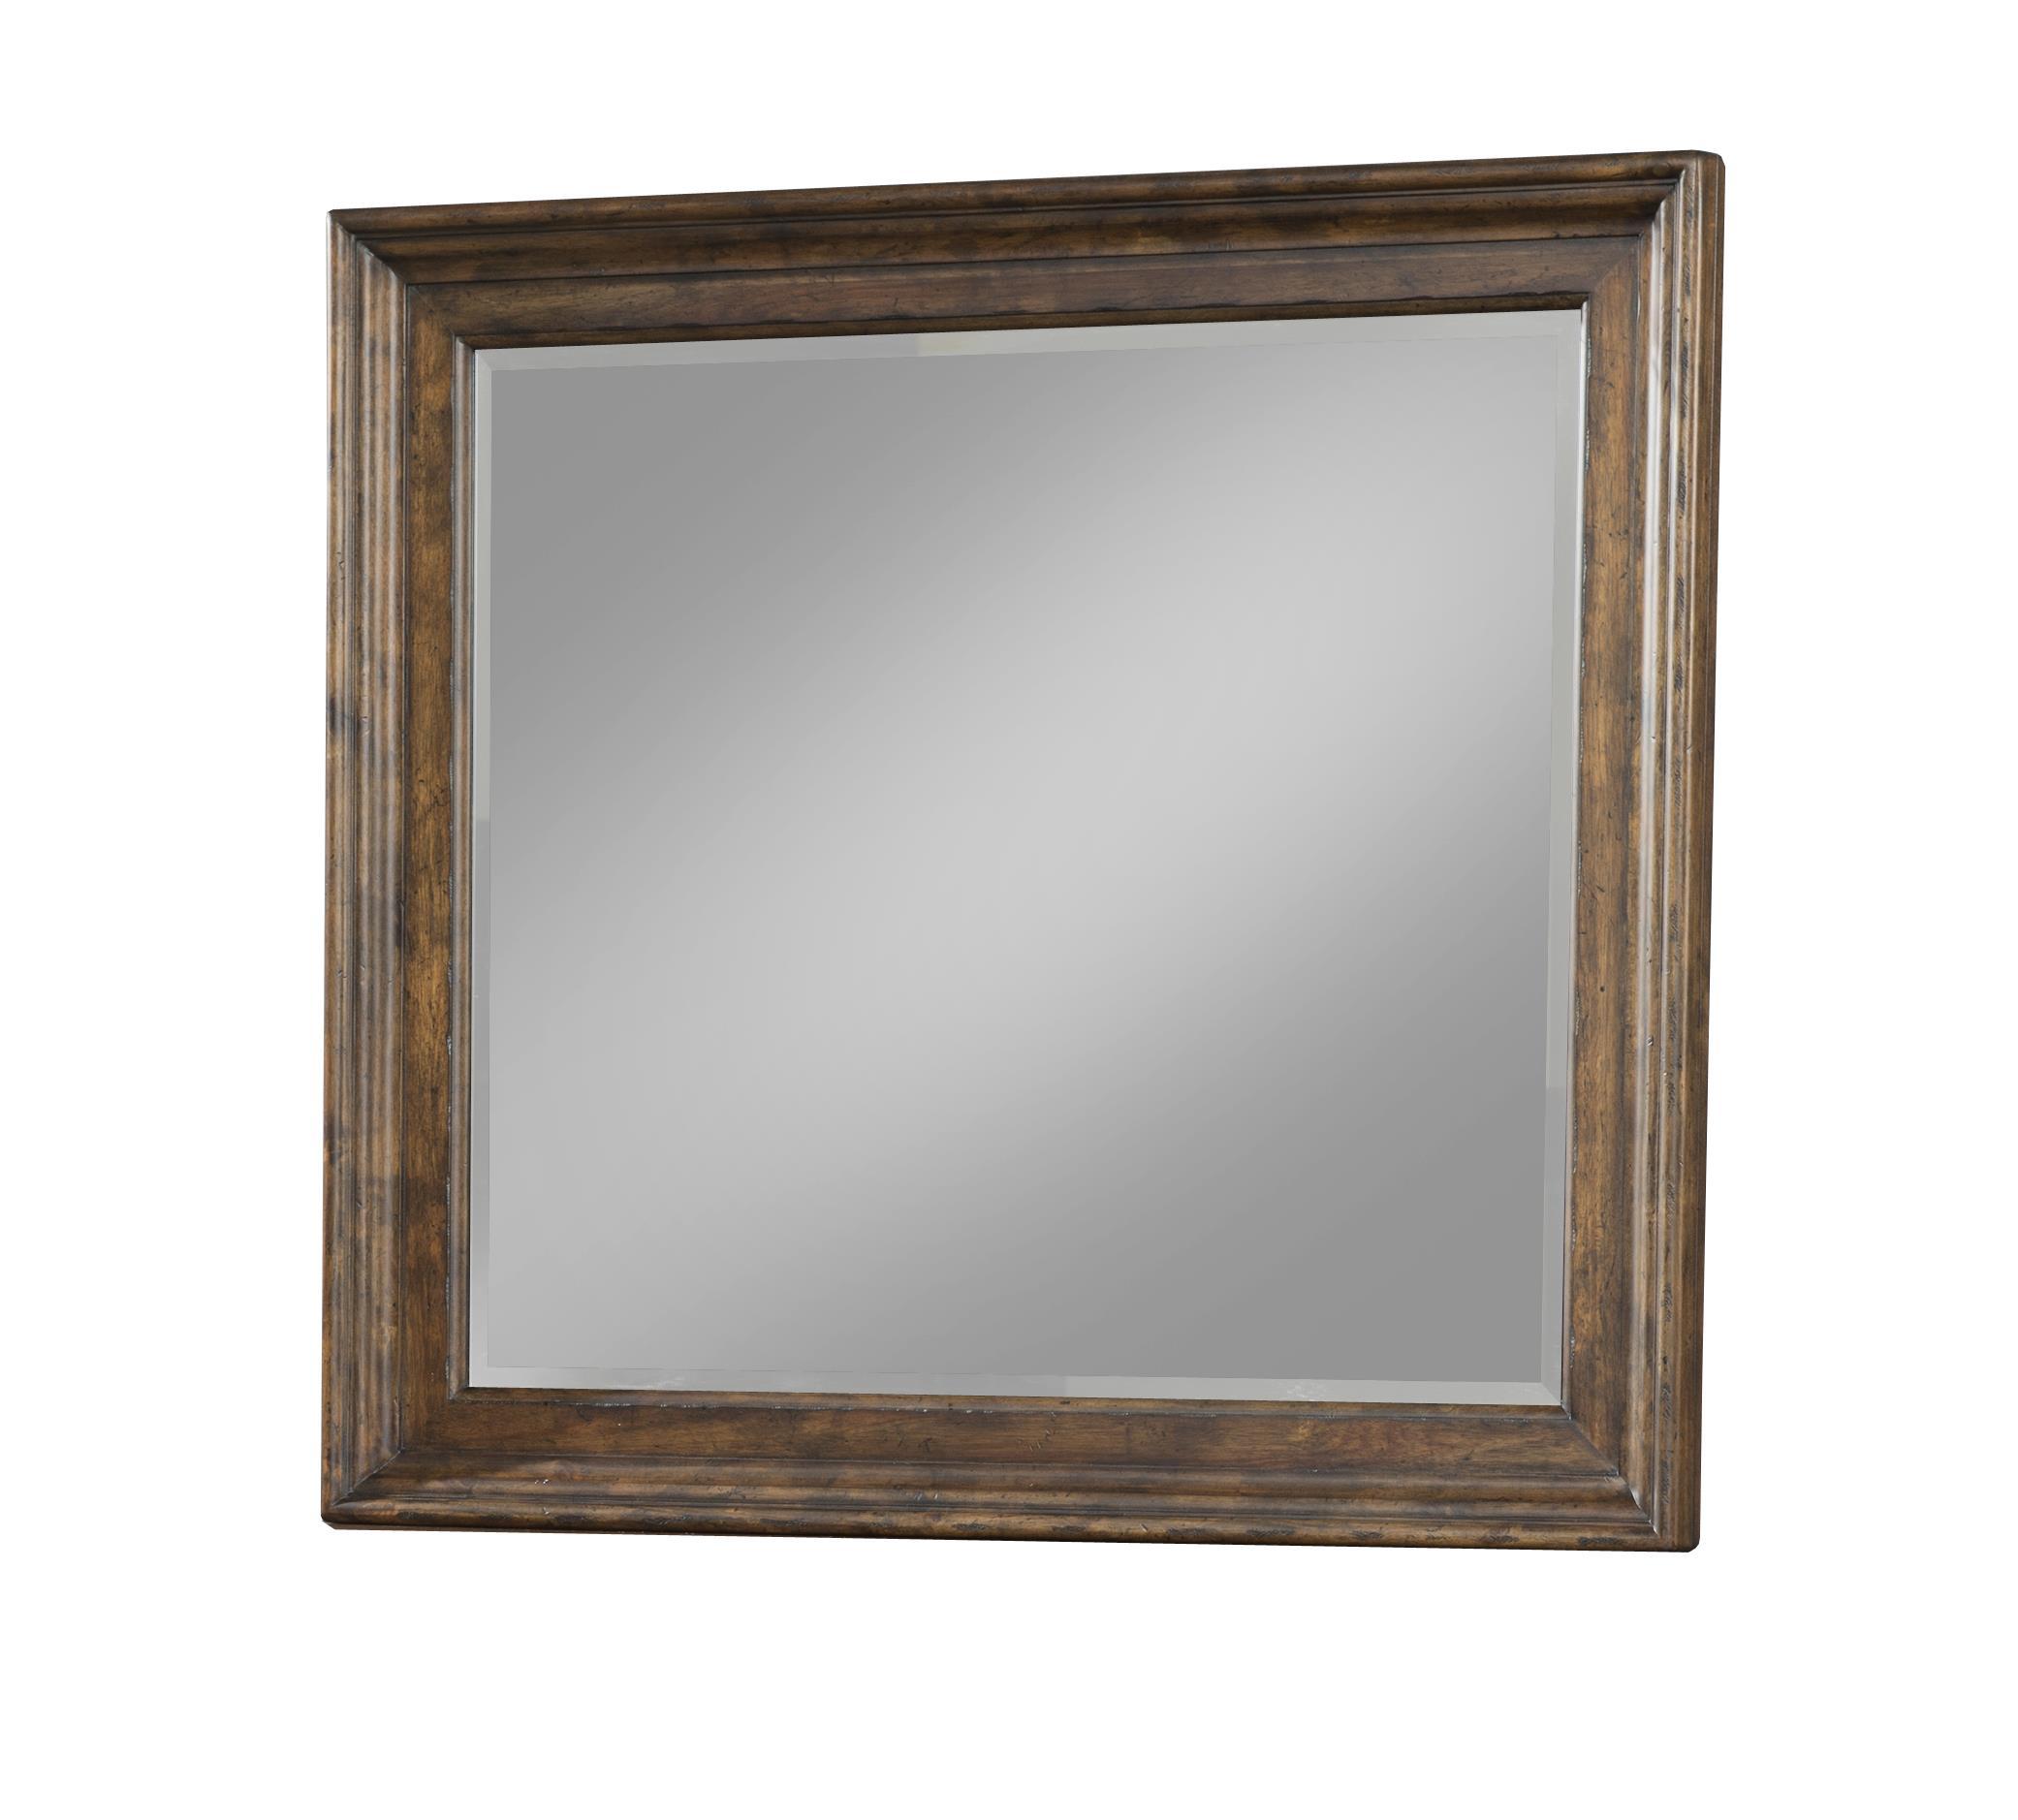 Trisha Yearwood Home Mirror Mirror Landscape Mirror by Trisha Yearwood Home Collection by Klaussner at Rotmans